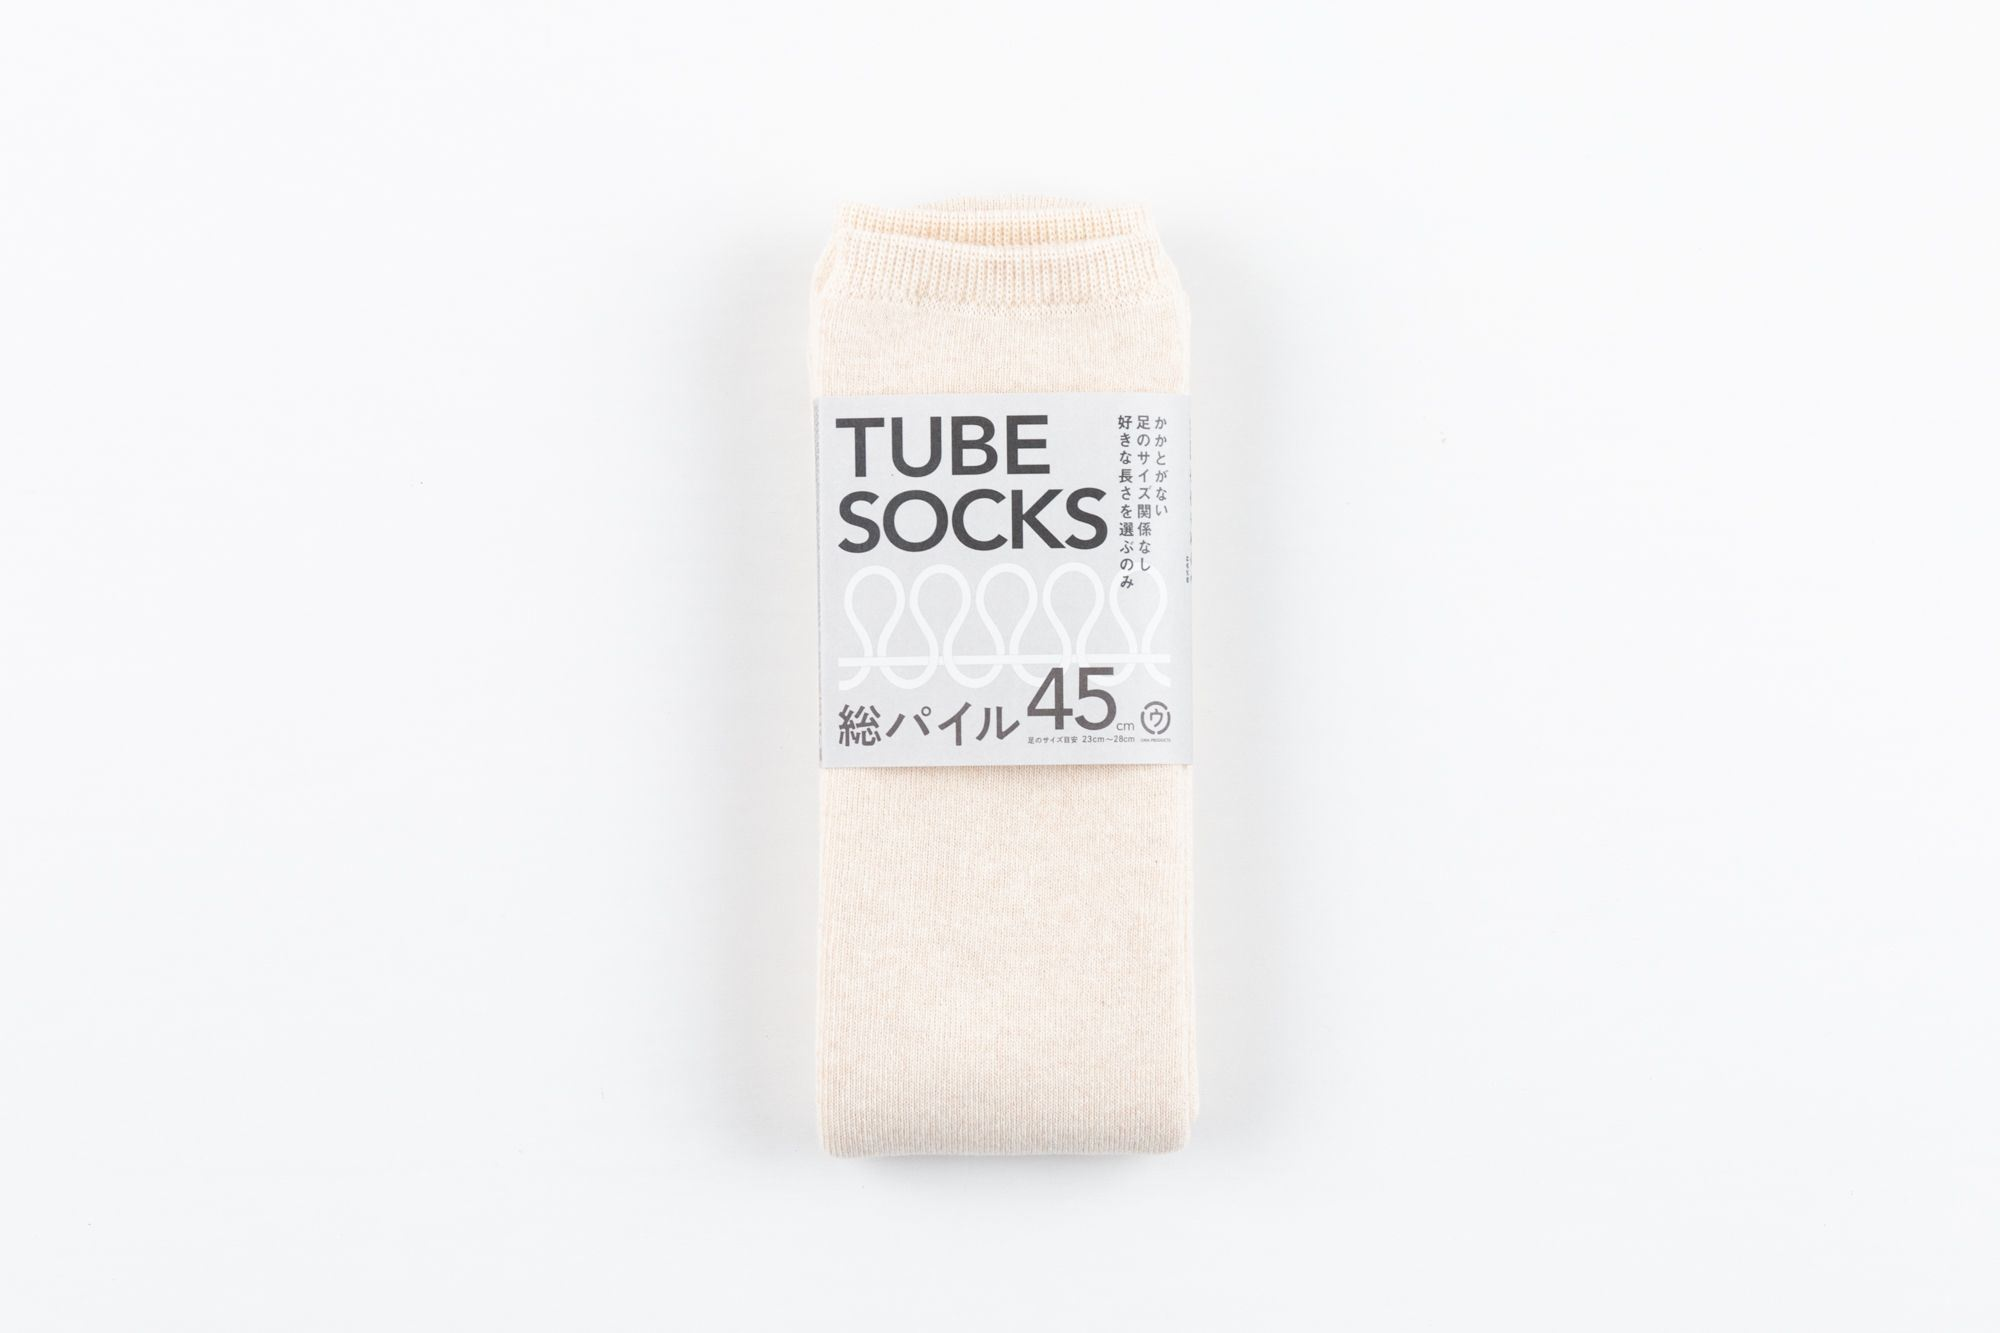 TUBE SOCKS パイル 45㎝ ベージュ